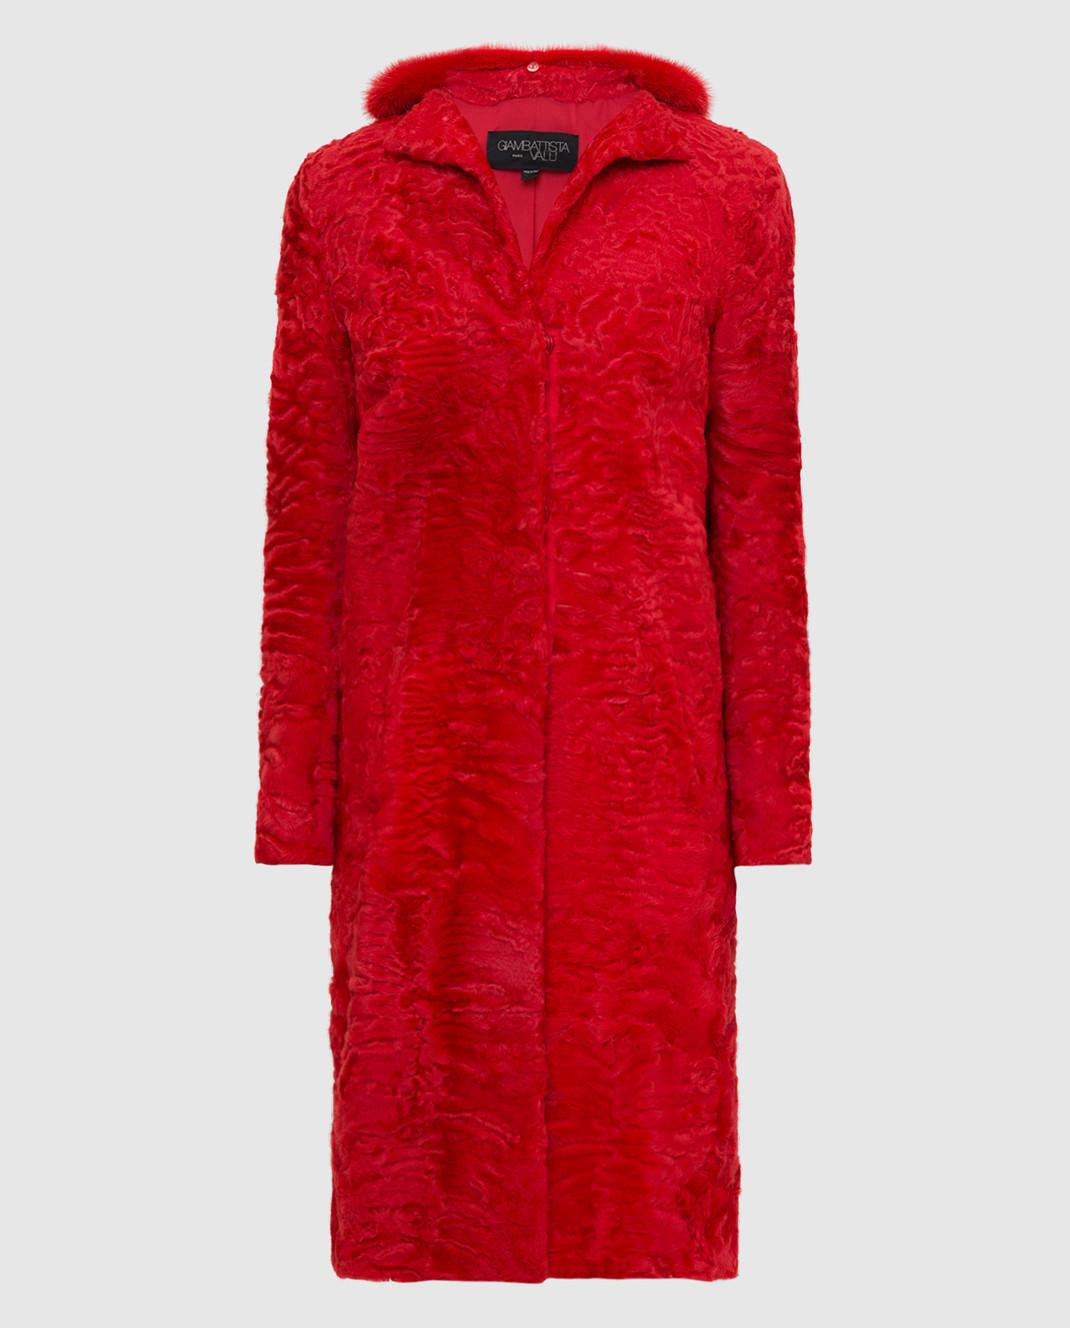 Giambattista Valli Красная шуба из персидского ягненка с воротником из меха норки GBE45A00CPP0365